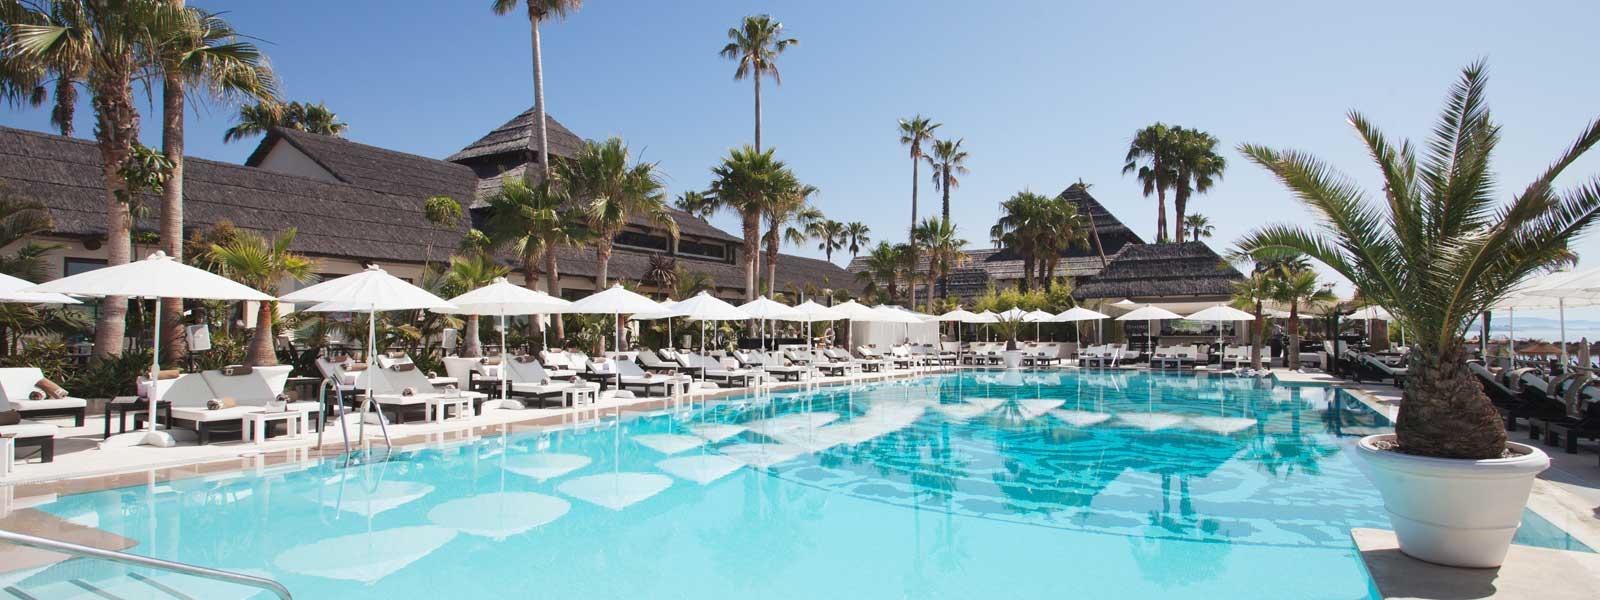 beach clubs in marbella